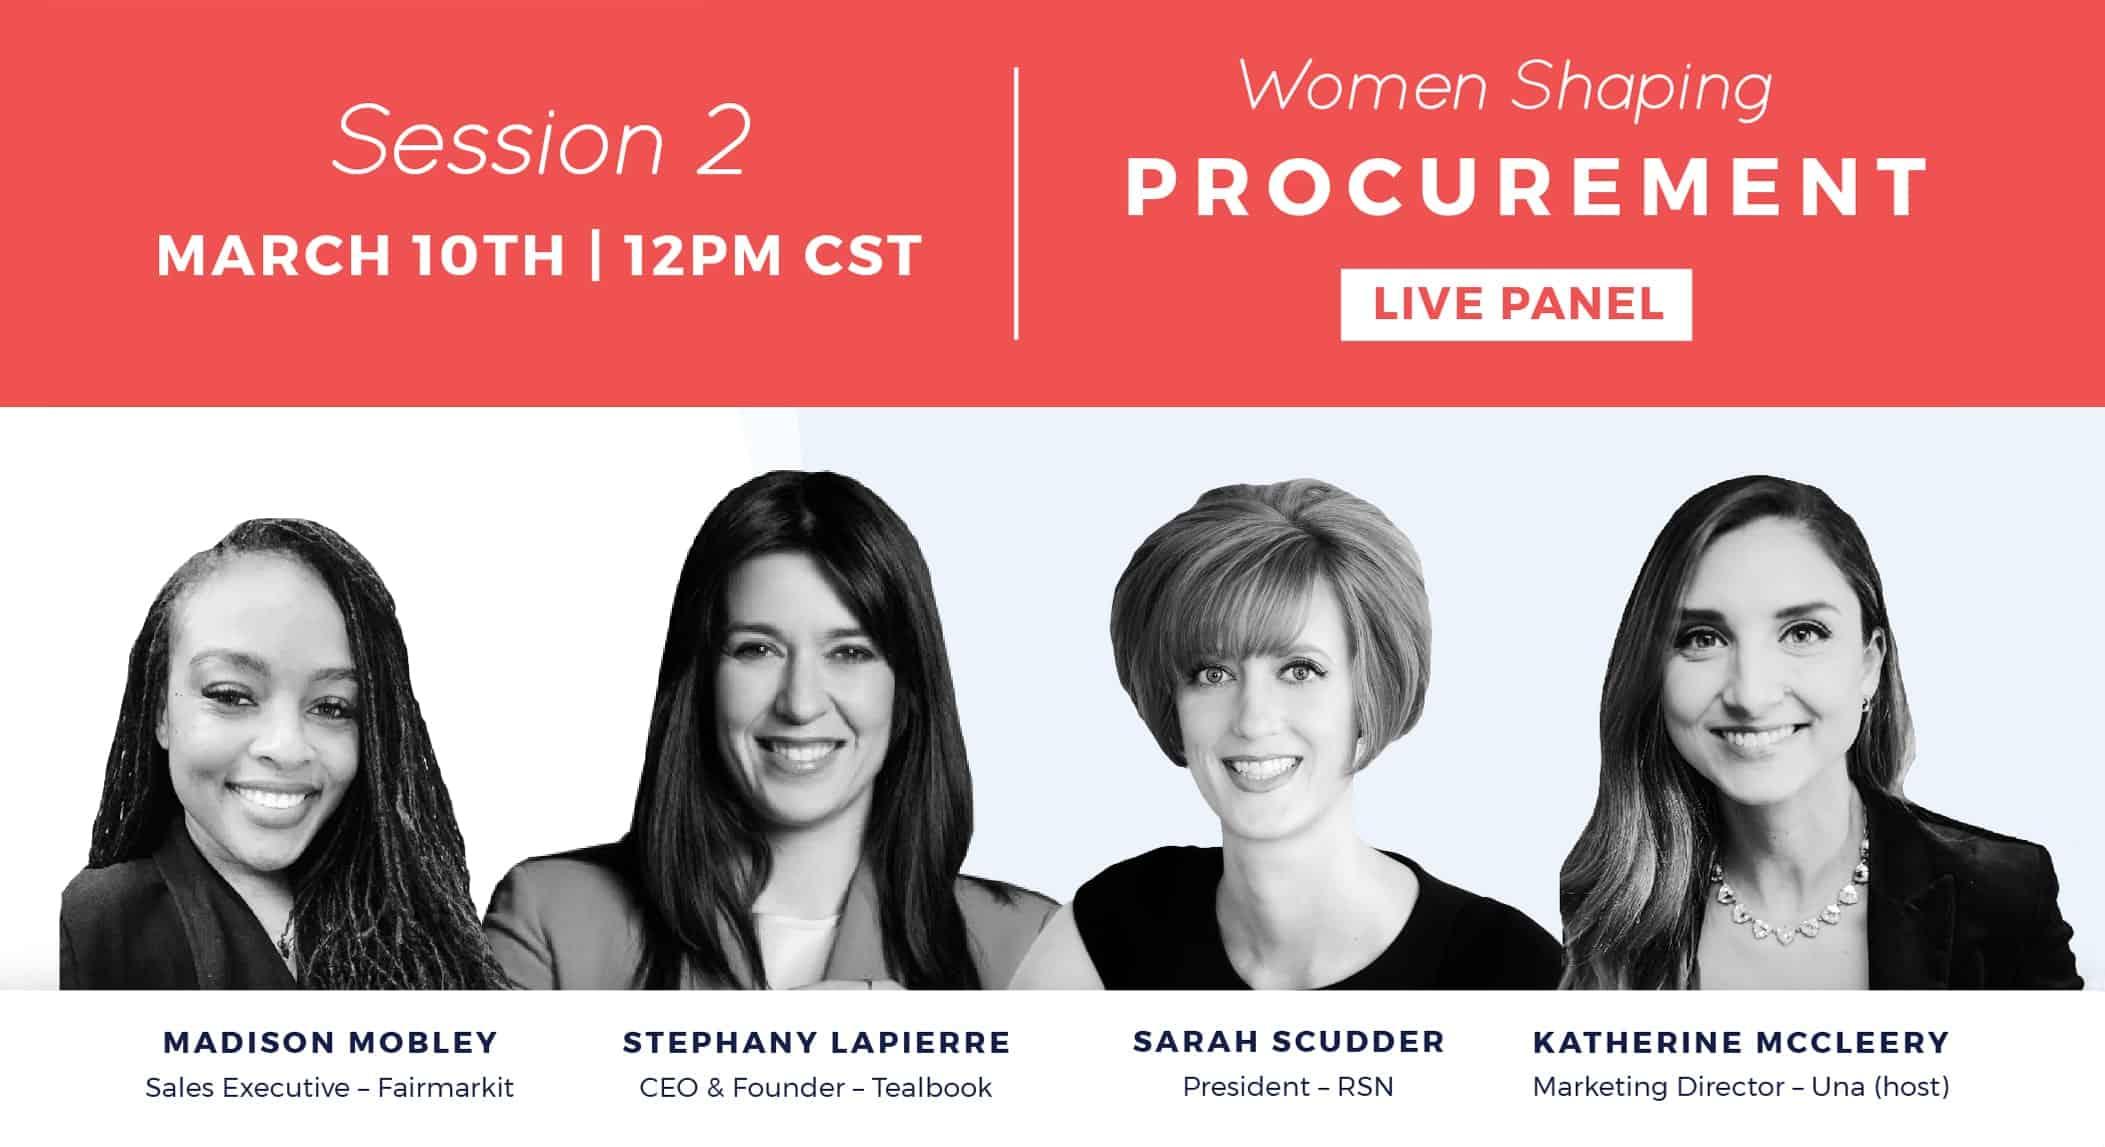 Ep 19: Women Shaping Procurement Live Panel Session #2